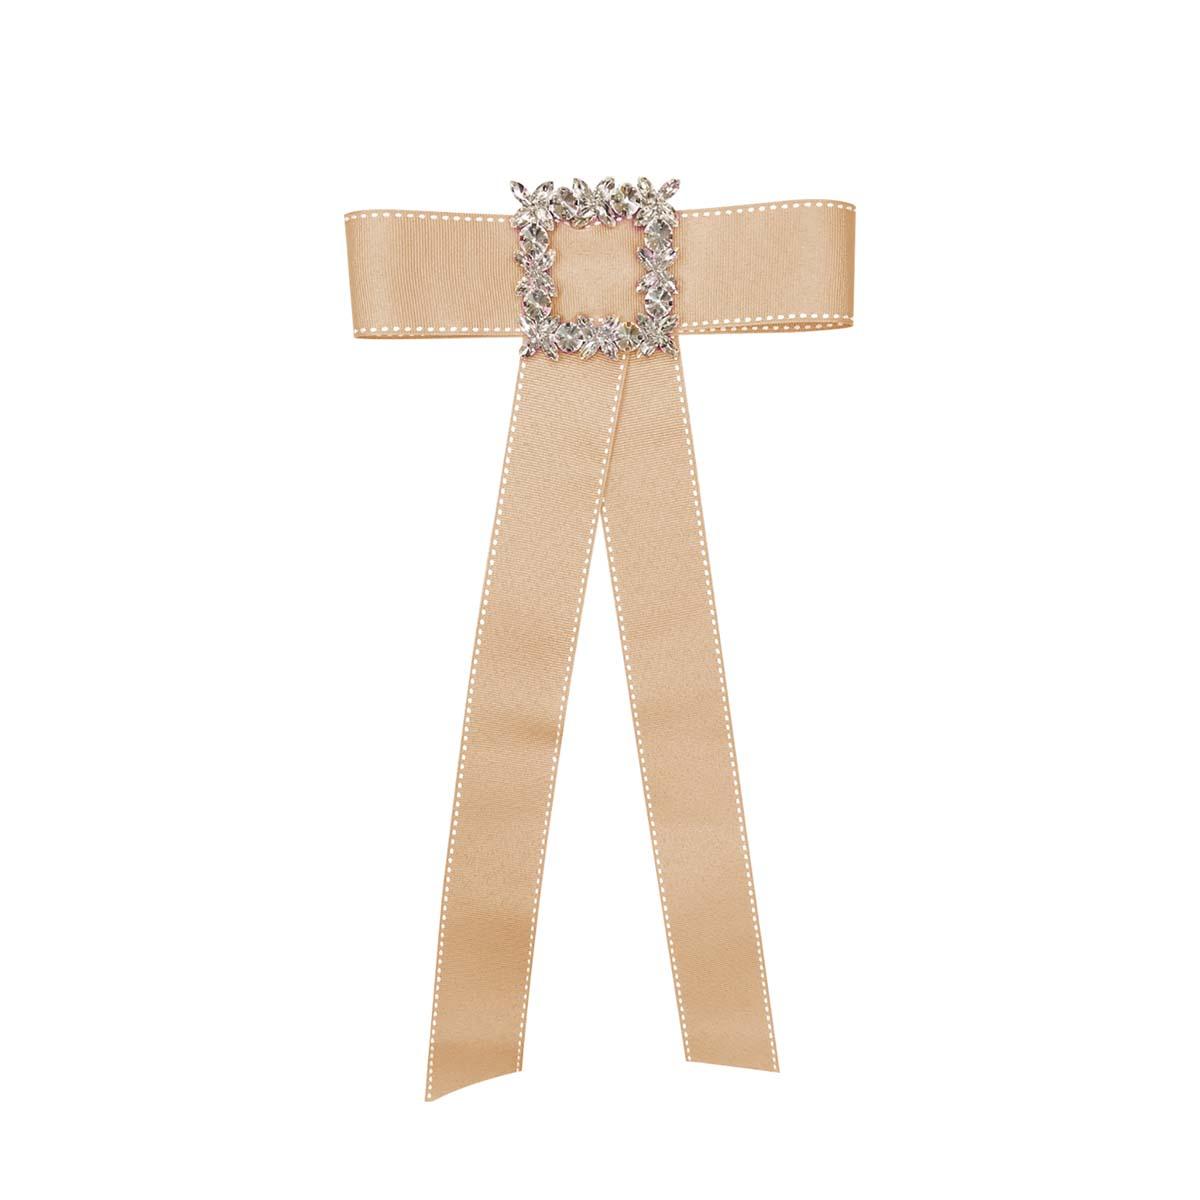 Teria Yabar - Broche corbata meolocotón